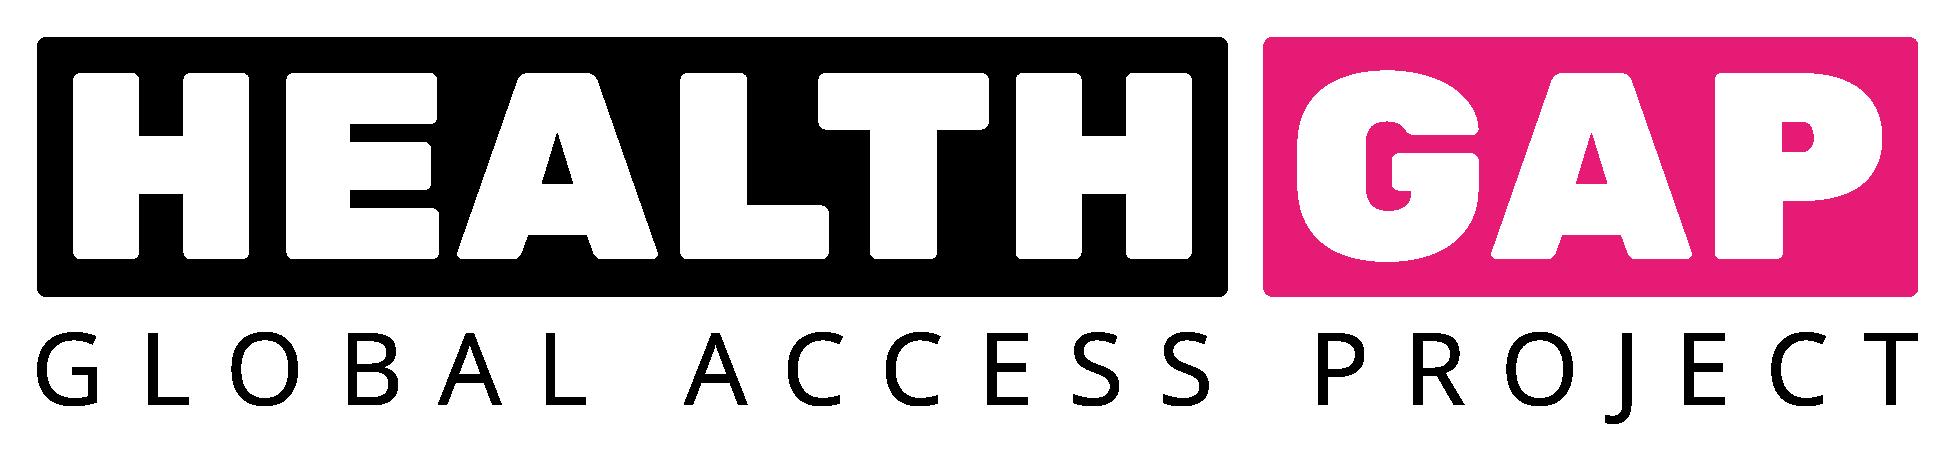 HGAP_logo_-_horiz_-_black_white_pink_clear.png